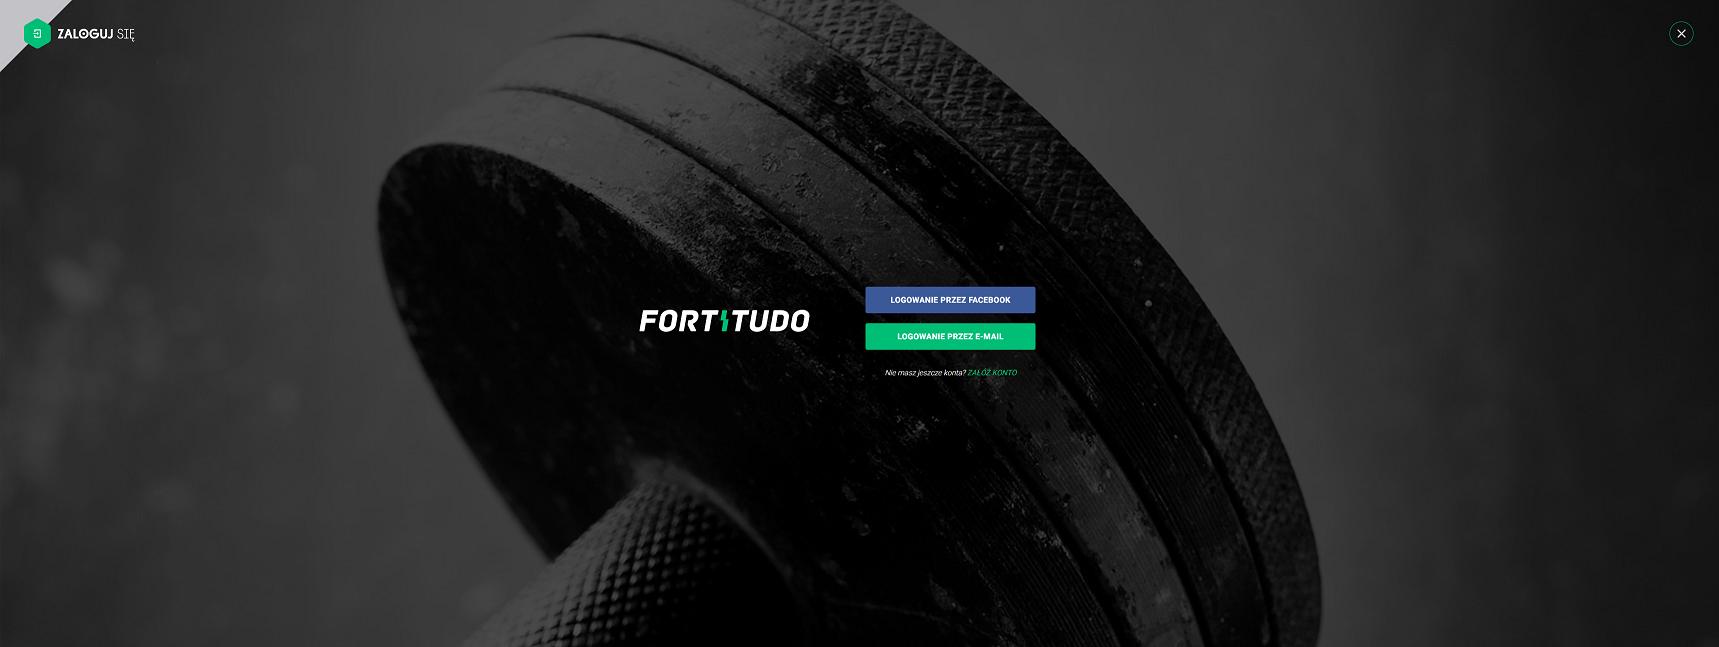 Fortitudo web platform released